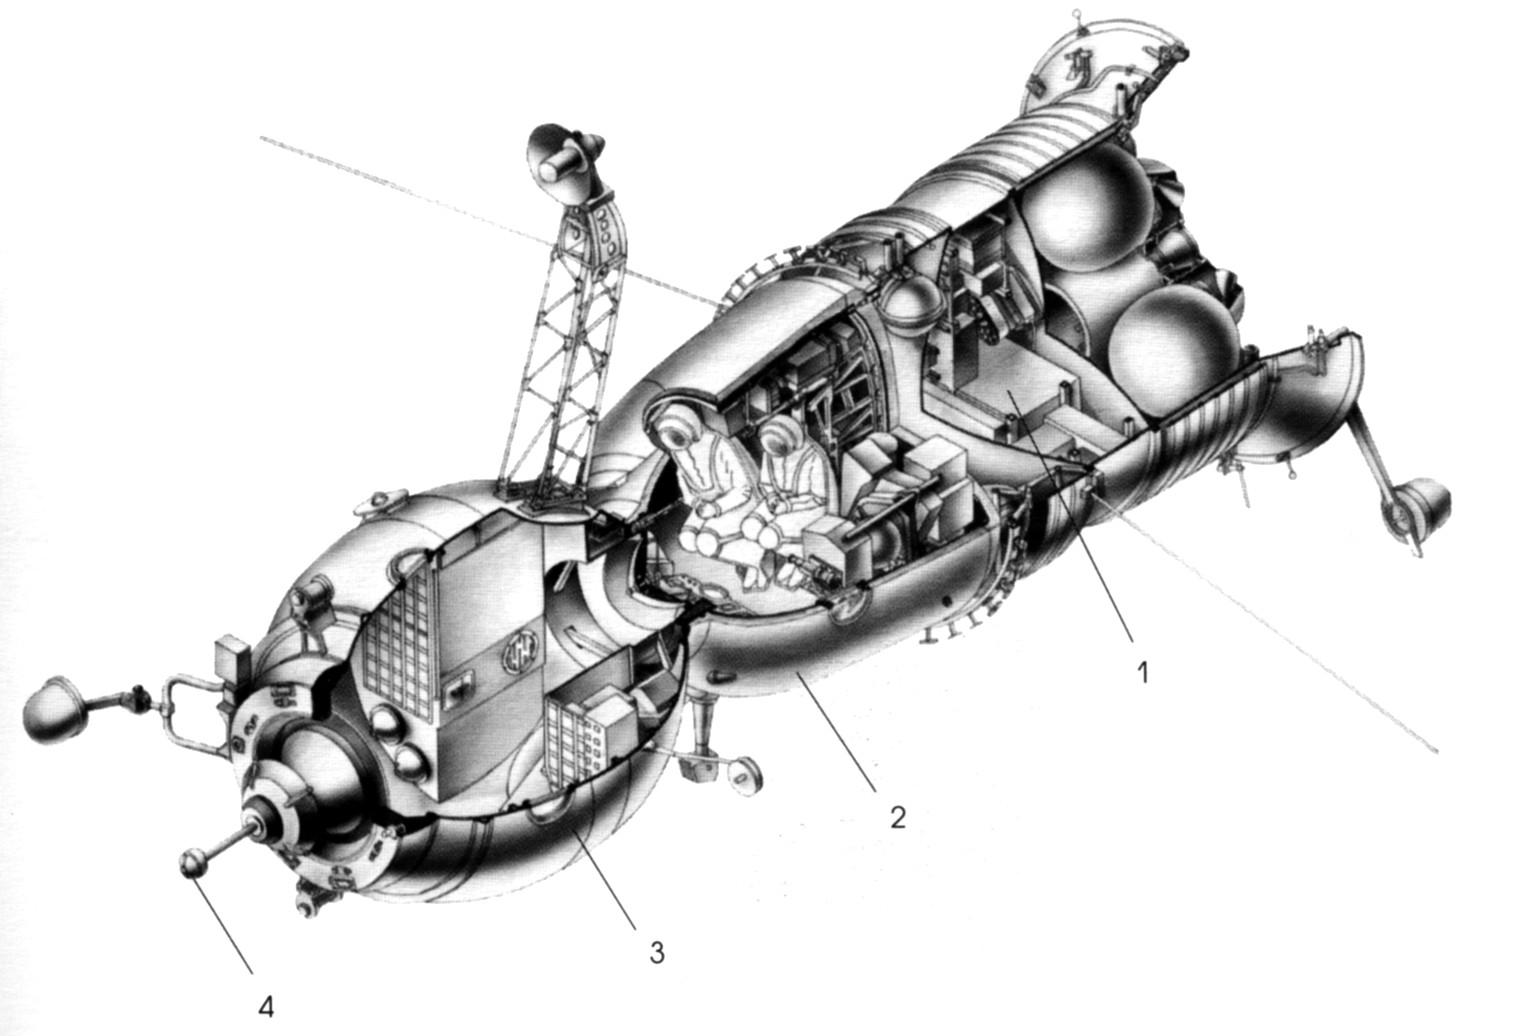 A History Of Suborbital Crewed Spaceflights